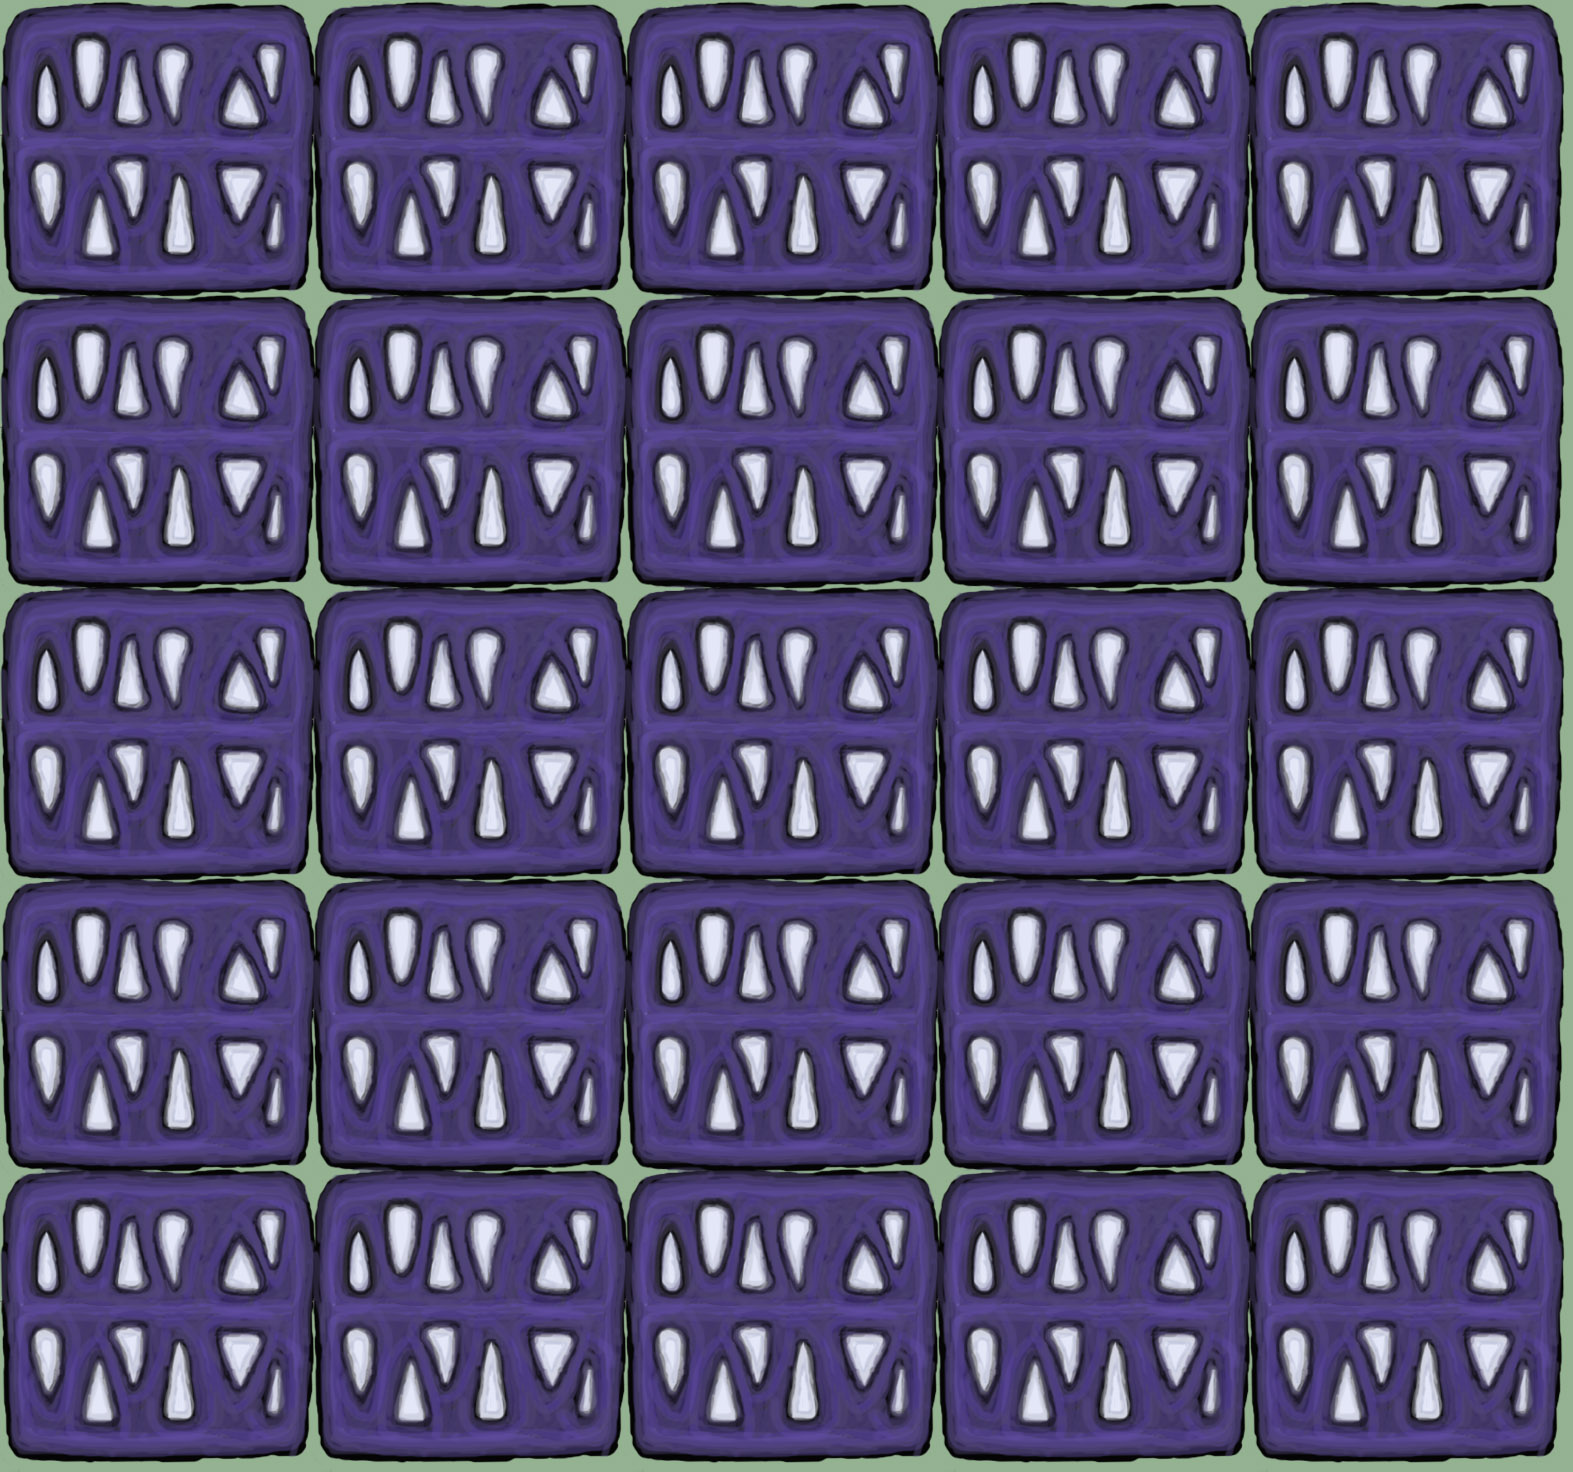 S'purple